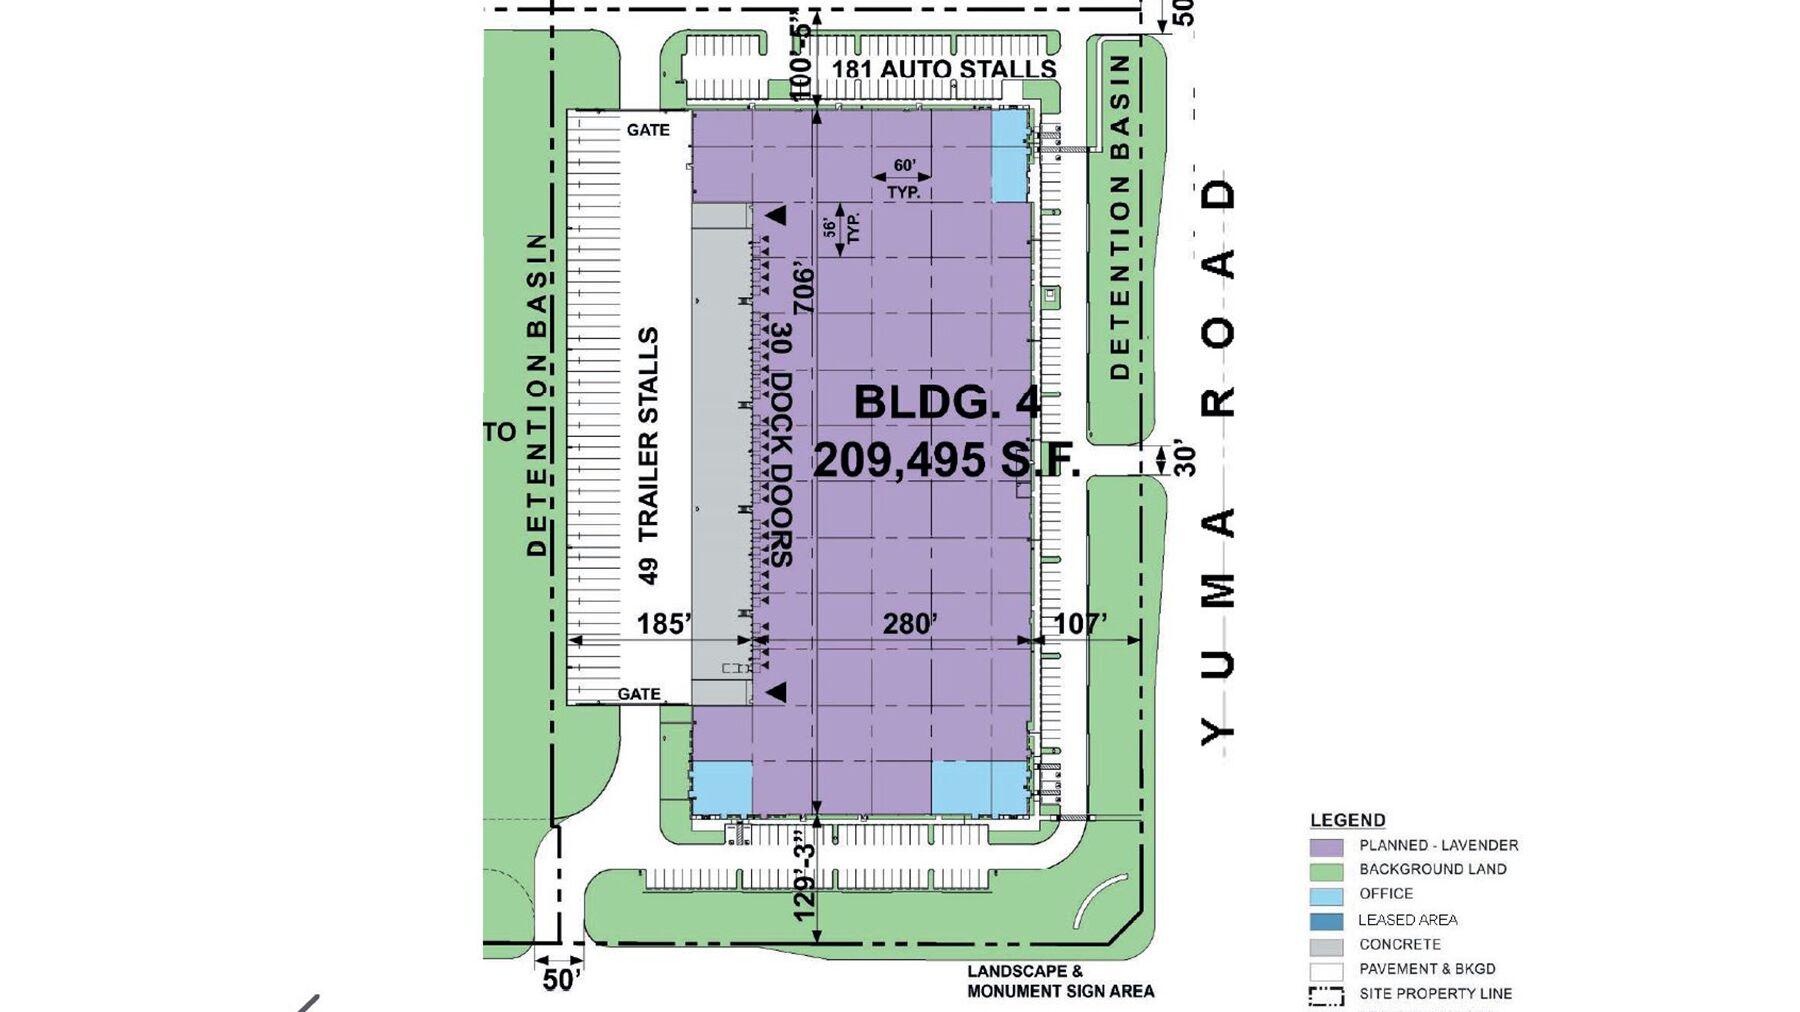 DPM-Building-4-site-plan.jpg